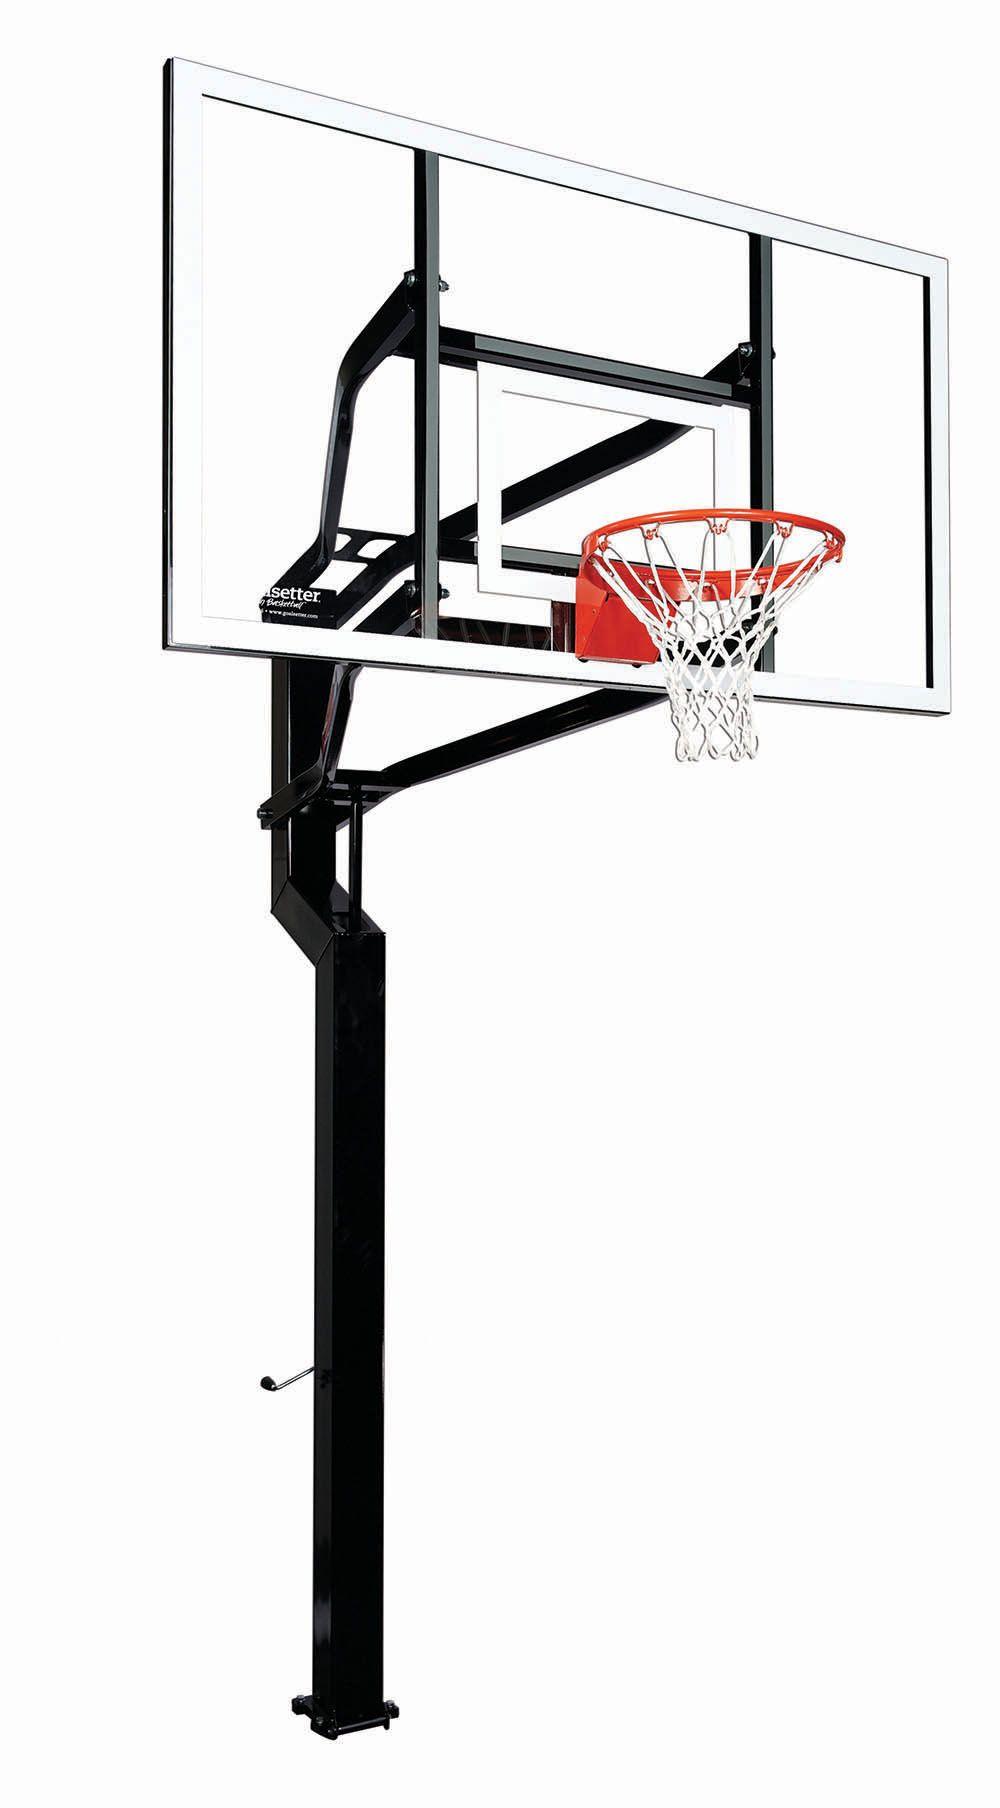 Swingset Toy Warehouse Basketball Pole Basketball Systems Basketball Hoop